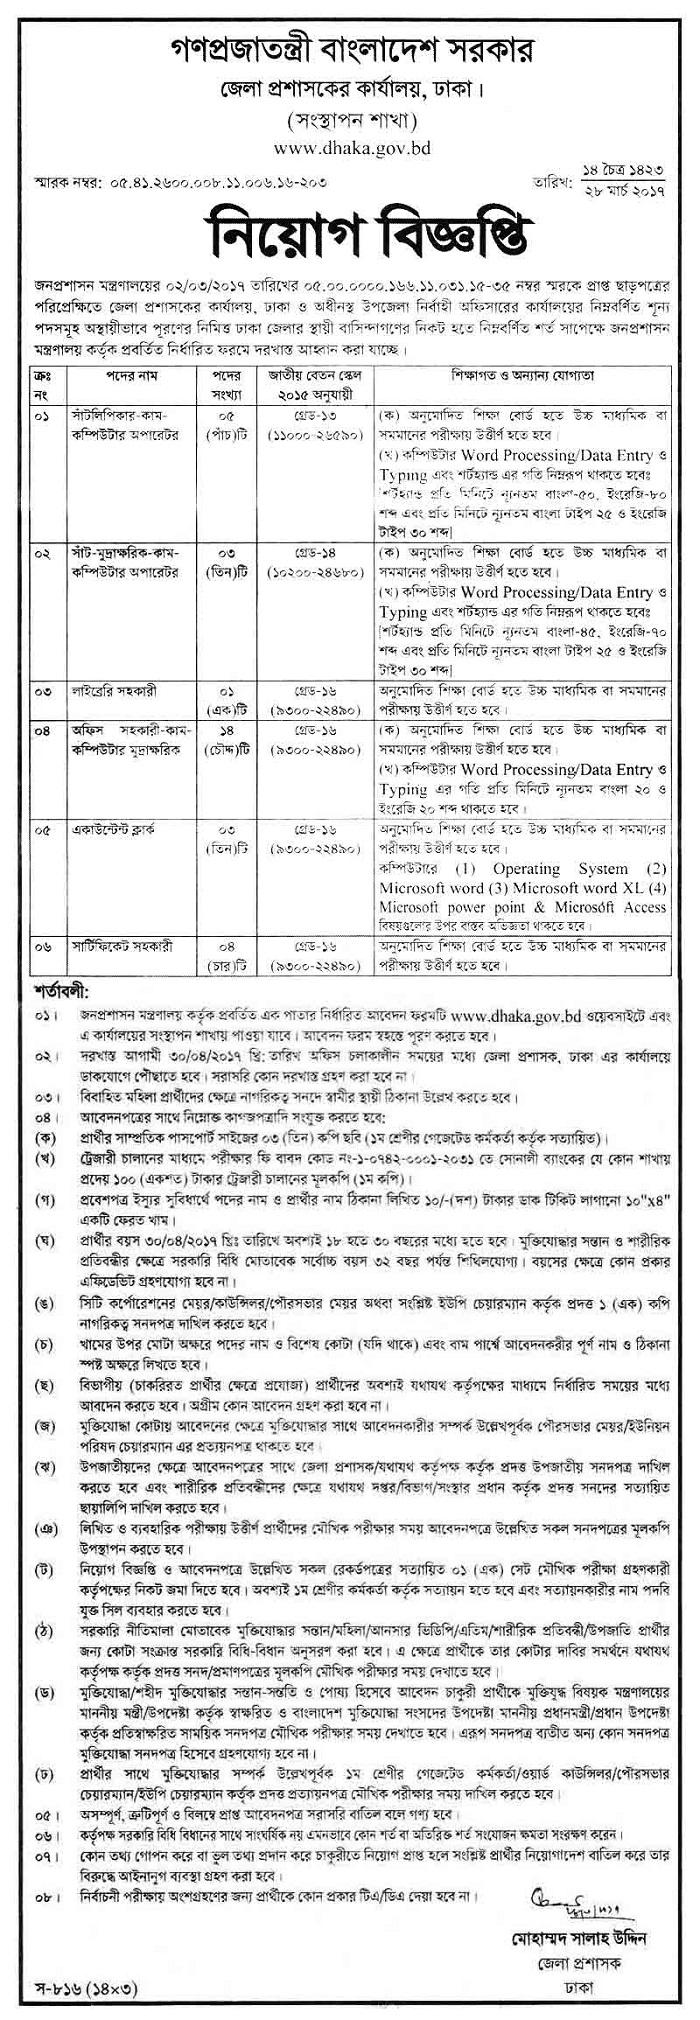 District Administration office of Dhaka Job Circular April 2017